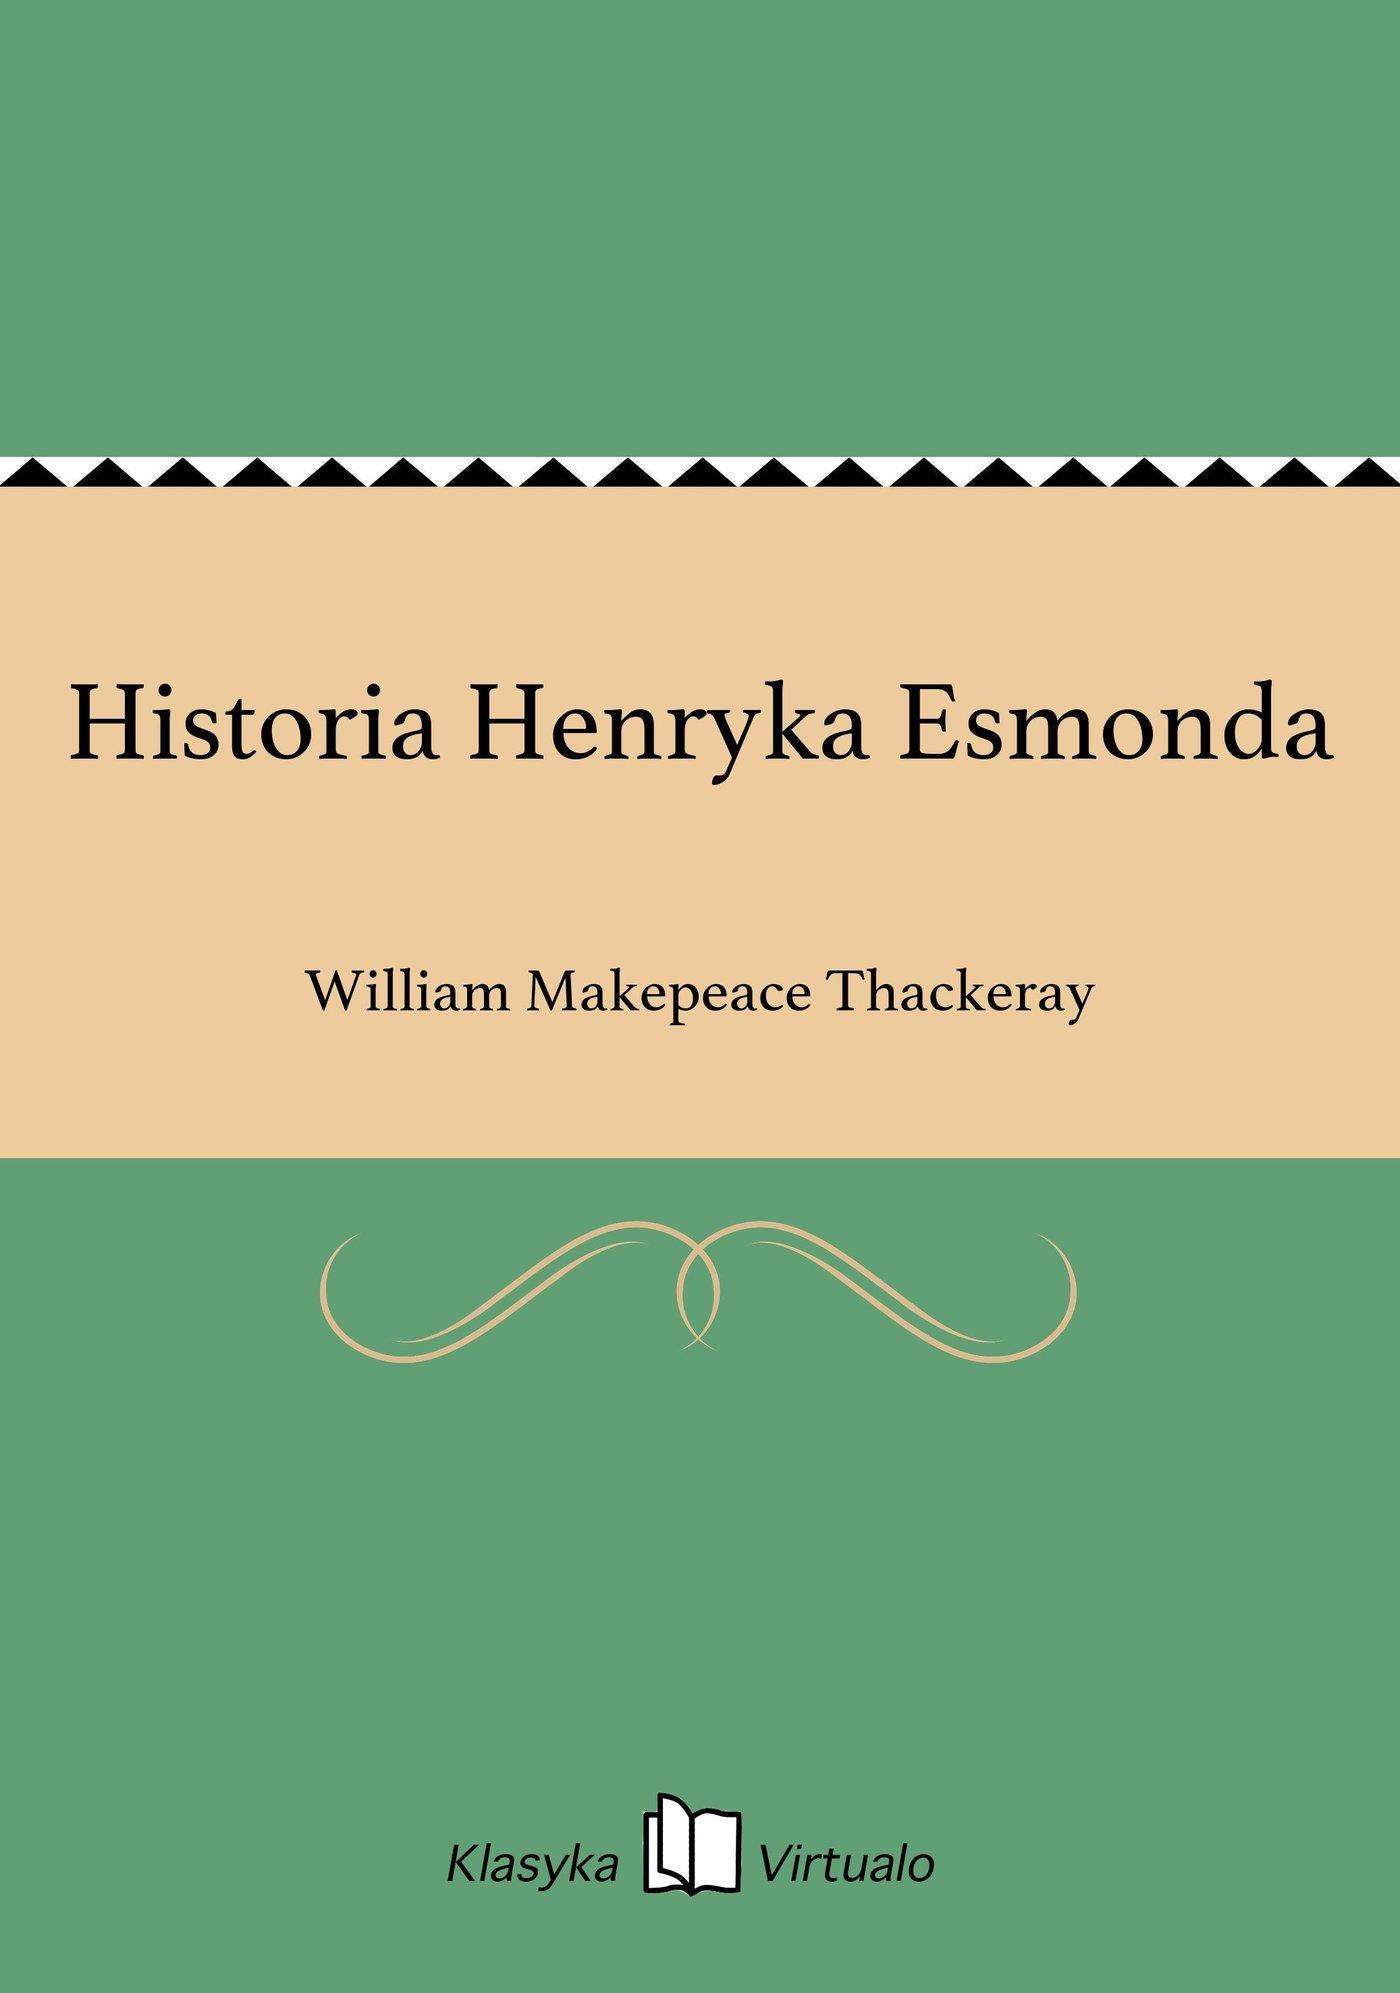 Historia Henryka Esmonda - Ebook (Książka EPUB) do pobrania w formacie EPUB